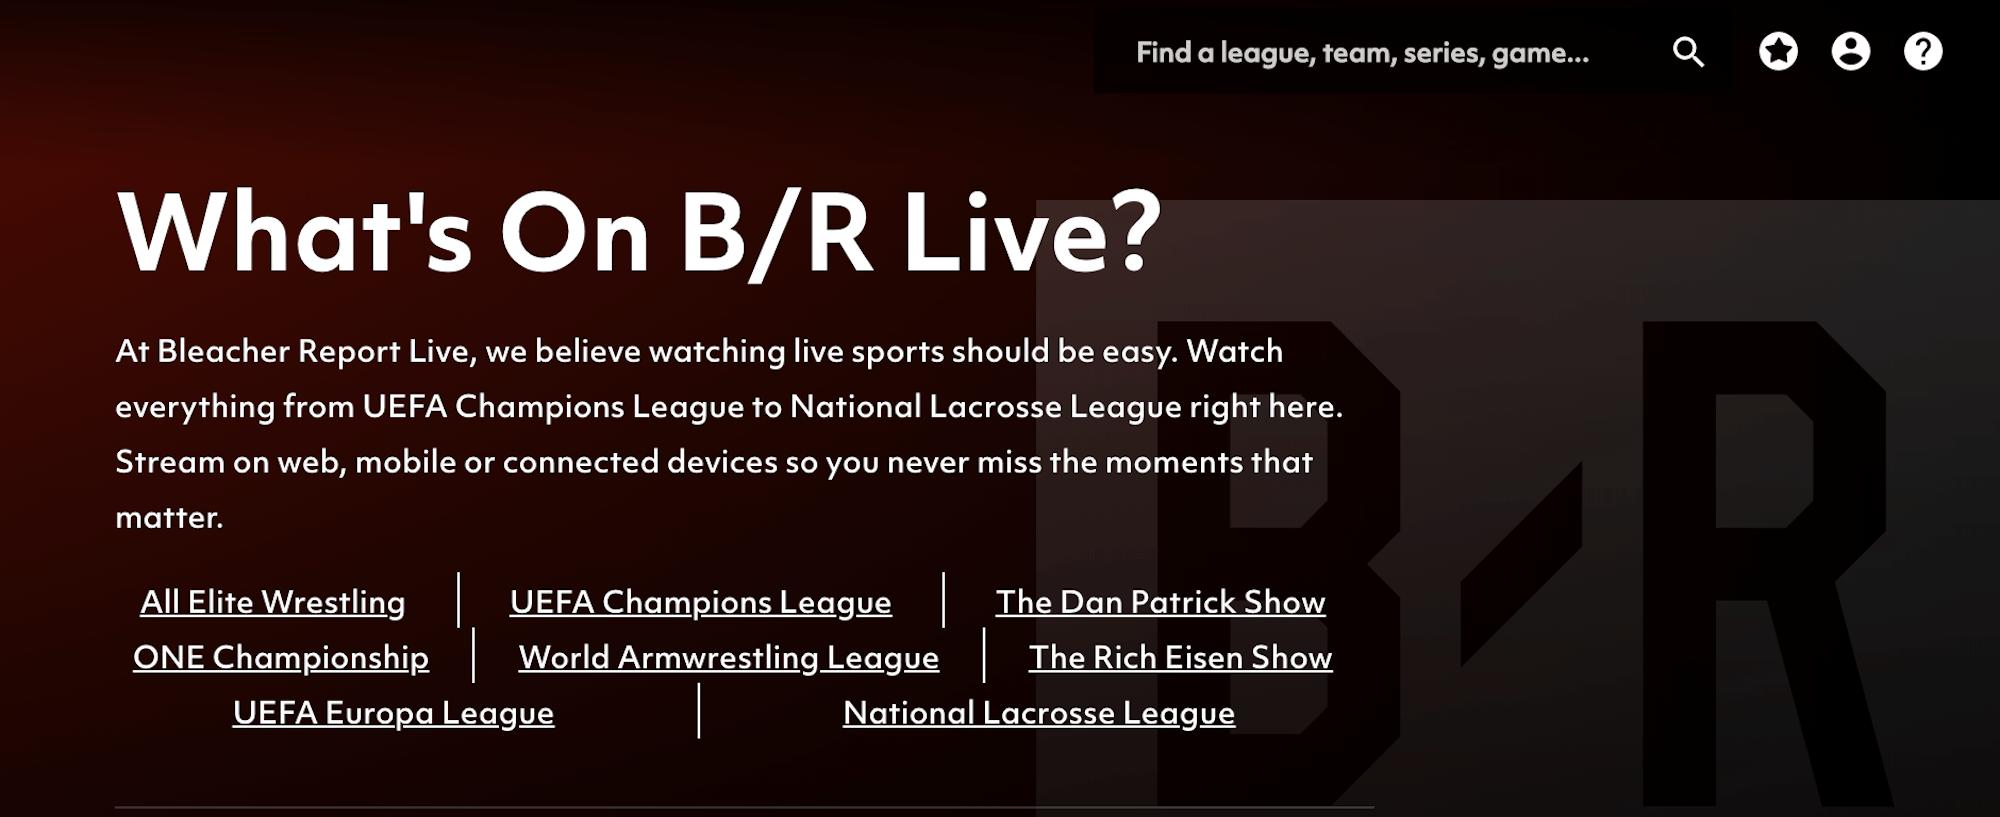 2019-20-uefa champions league liverpool vs red bull salzburg soccer live stream free b-r live